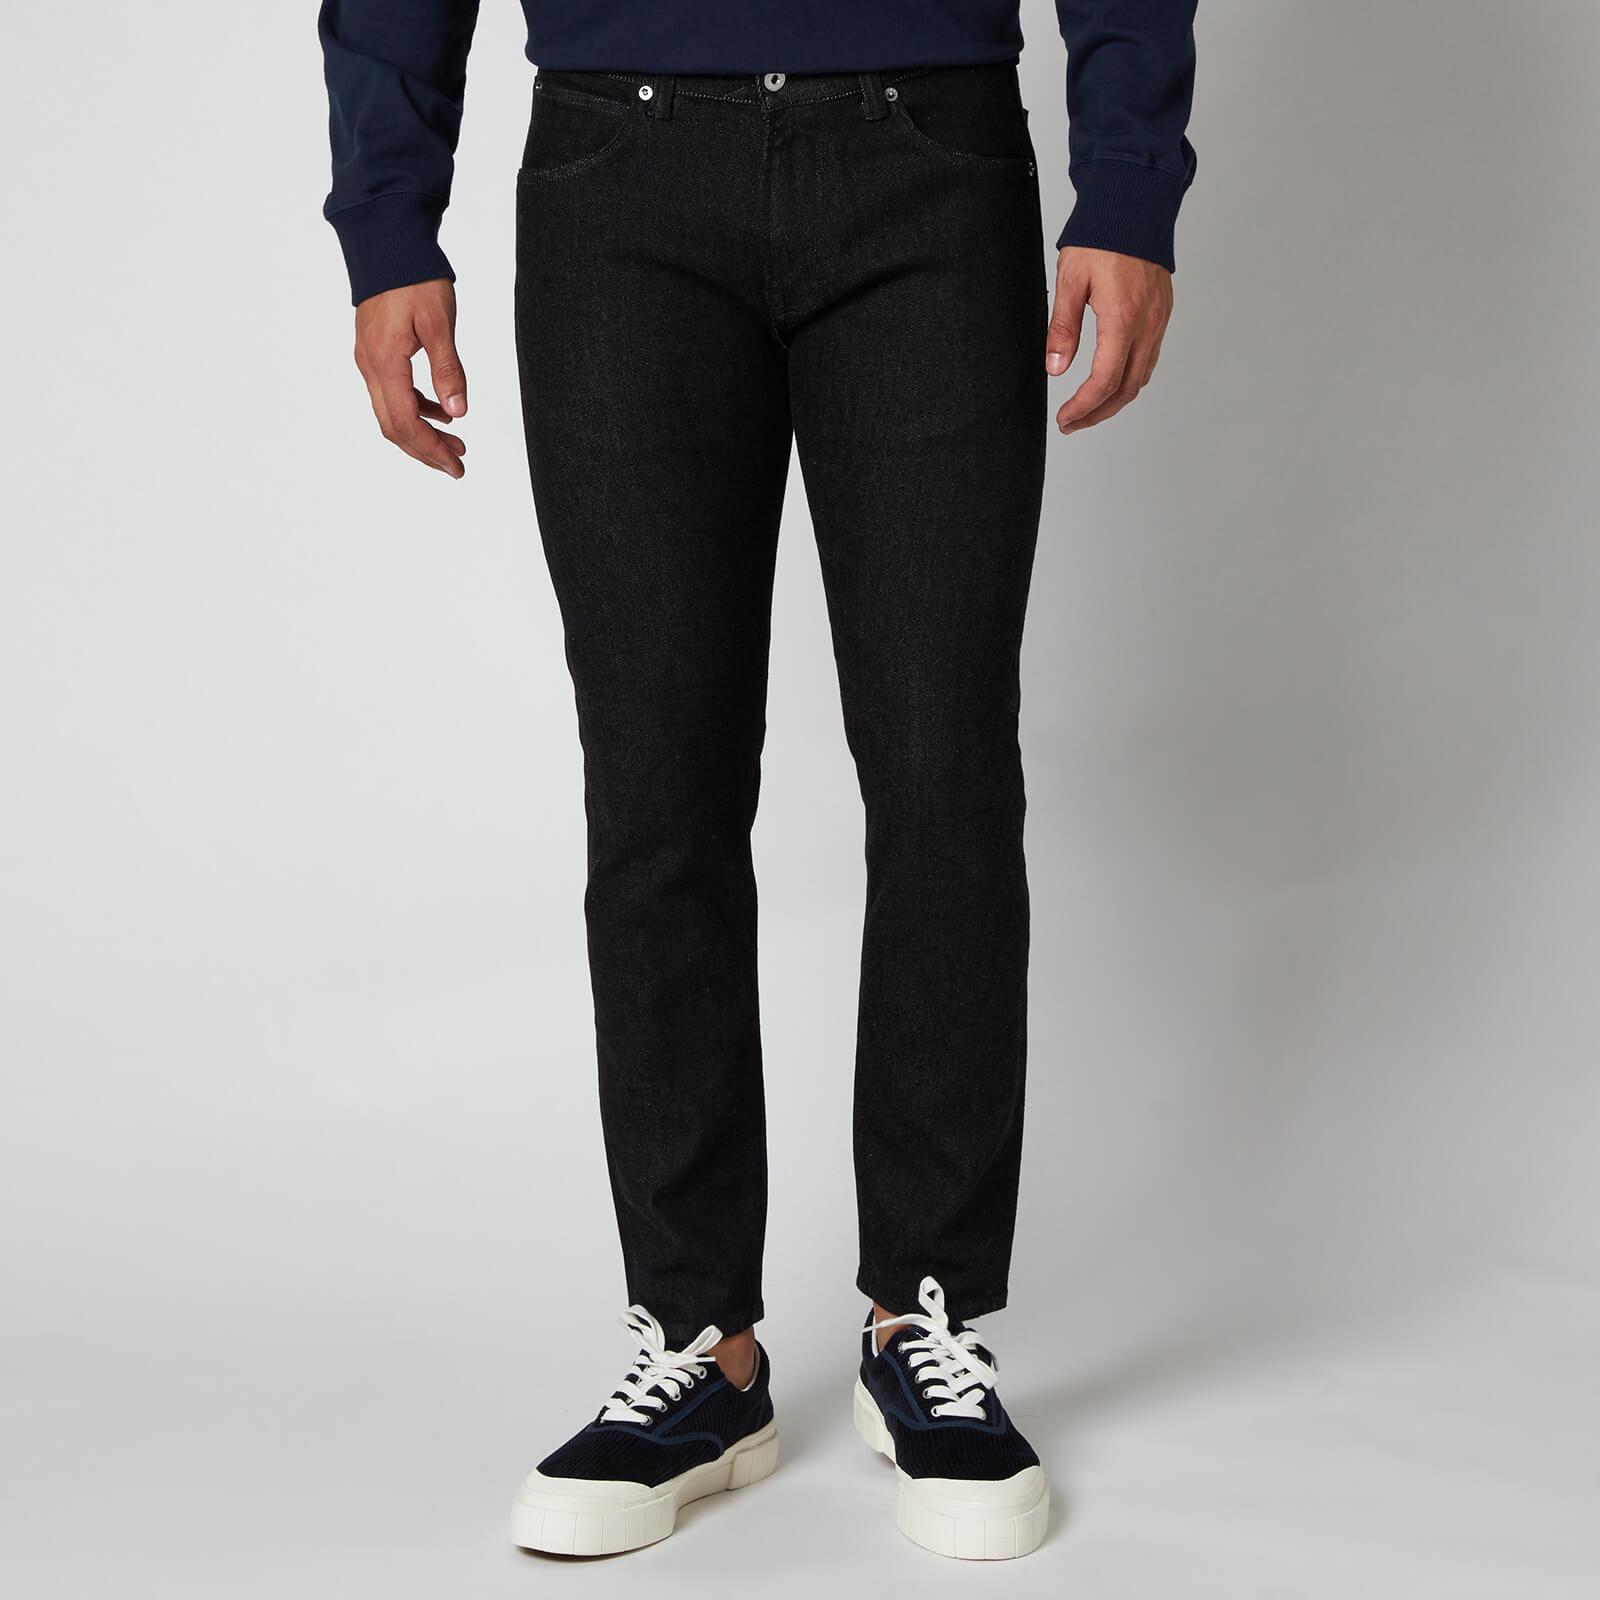 Edwin Men's Ed-85 Slim Tapered Cs Ayano Drop Crotch Rinsed Jeans - Black - W32/L32